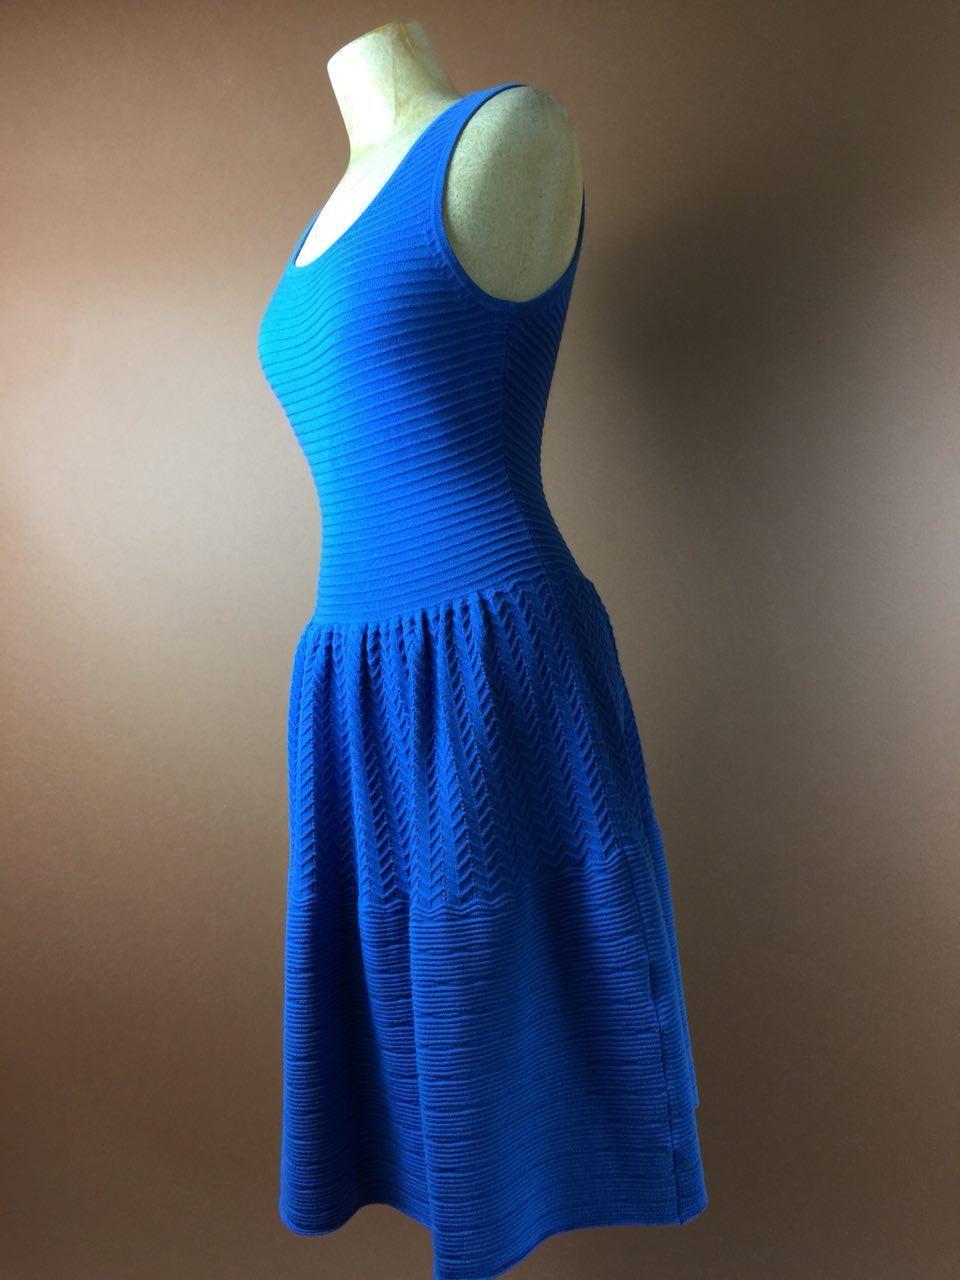 Pinup full gathered us vintage dress royal blue small us uk